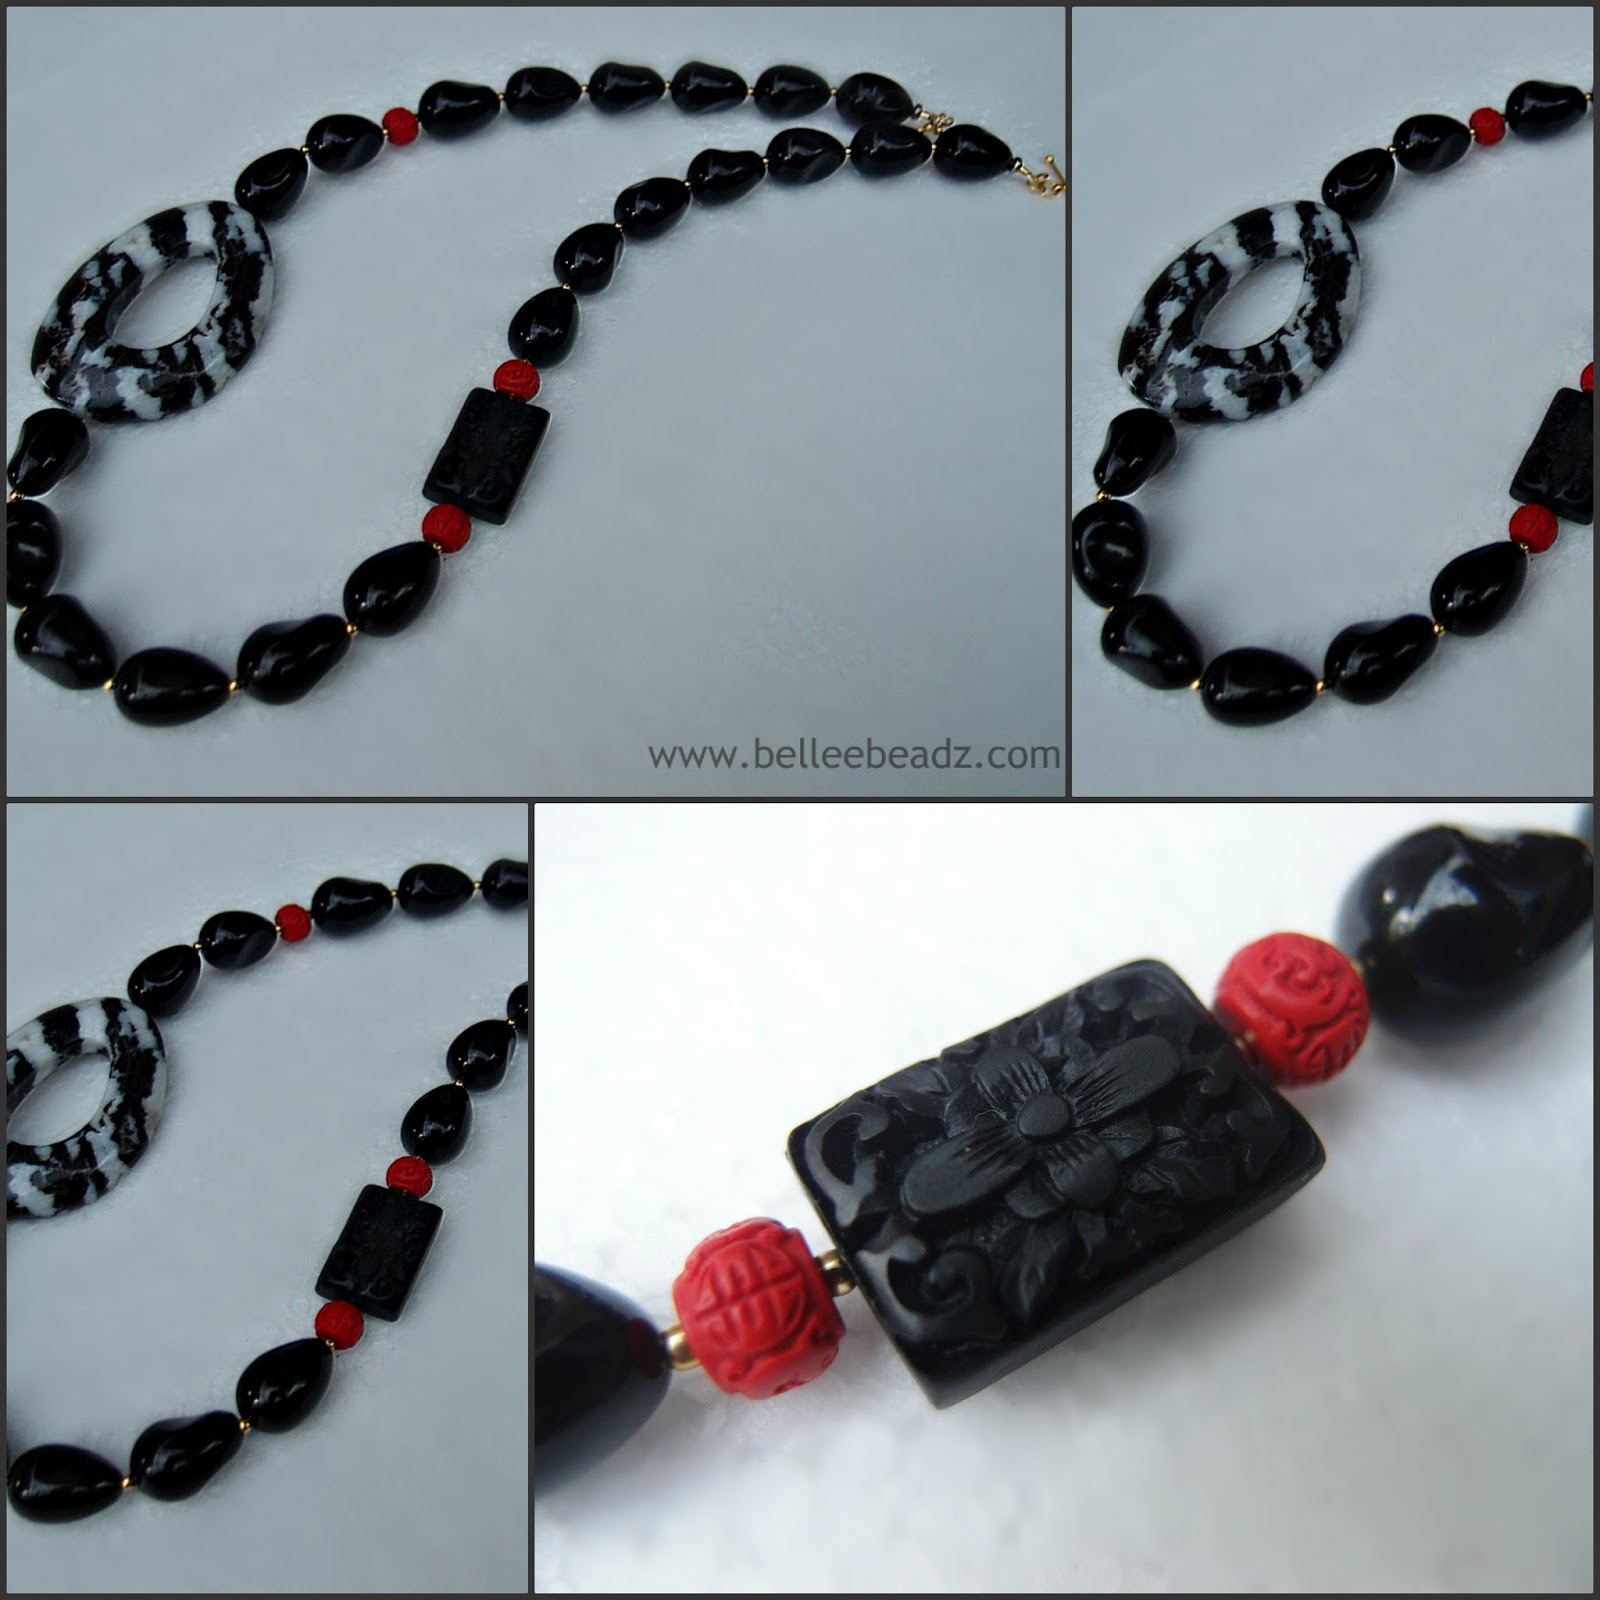 Custom Engraved PERSONALIZED Black Onyx Cushion Beads 15mm X 8mm 3